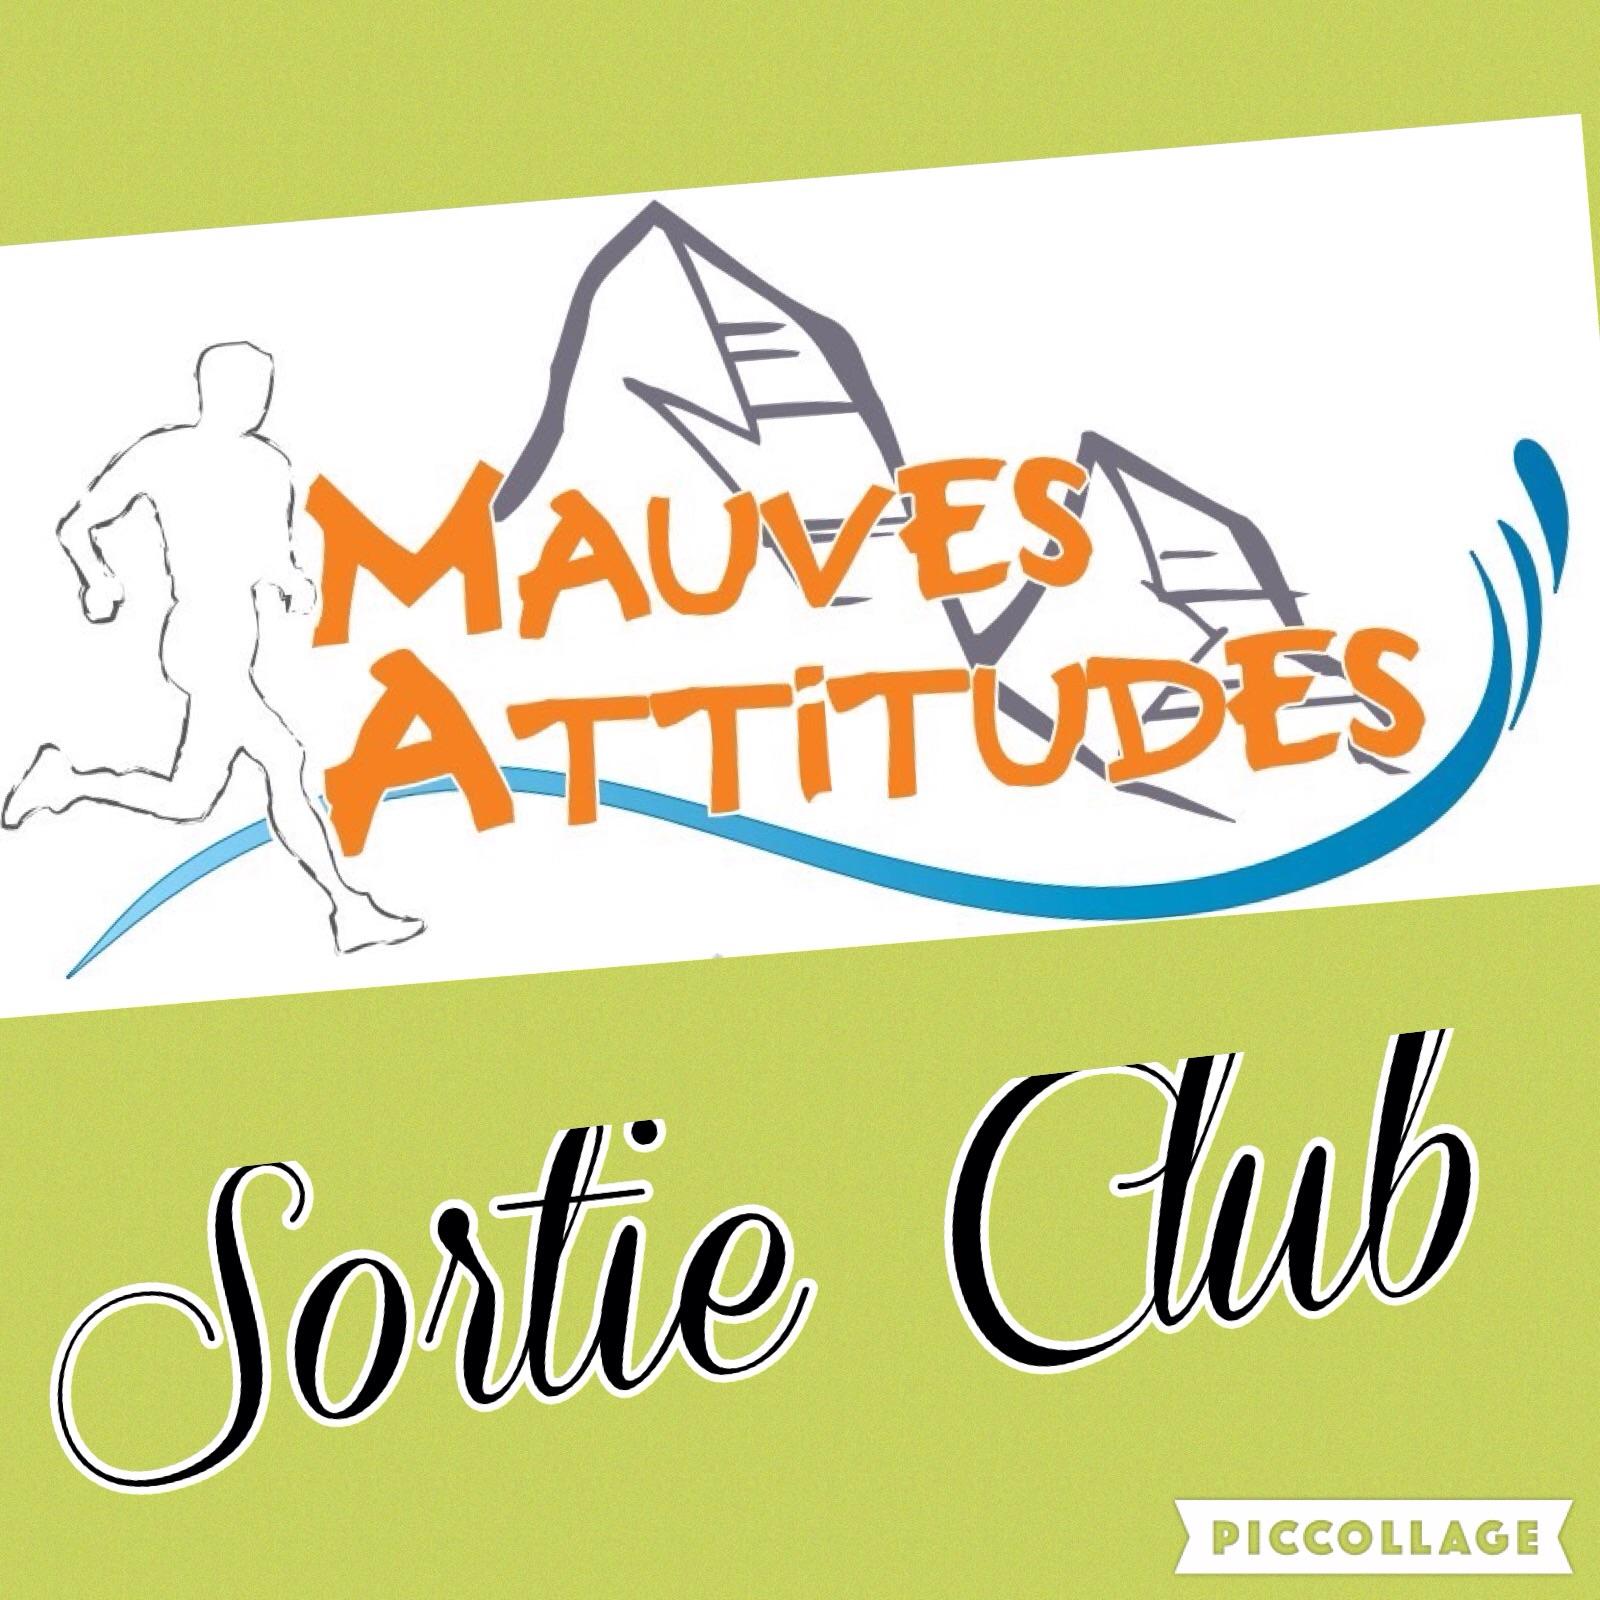 Sortie club